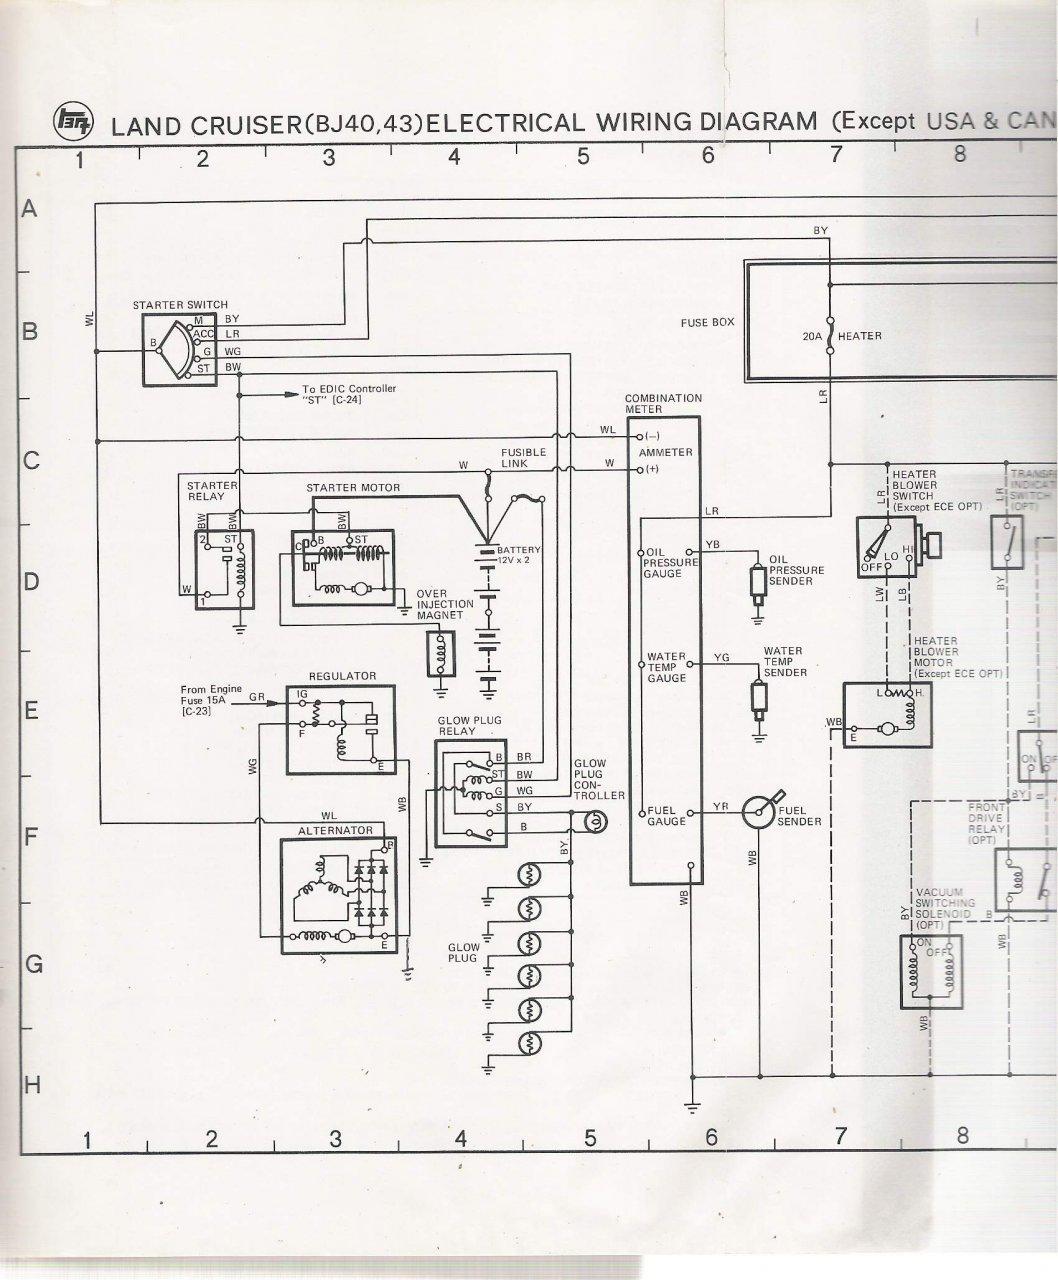 Jcb Ignition Switch Wiring Diagram Finlandia Wiring Diagram 02 Bmw – Jcb Backhoe Wiring Diagram 1994